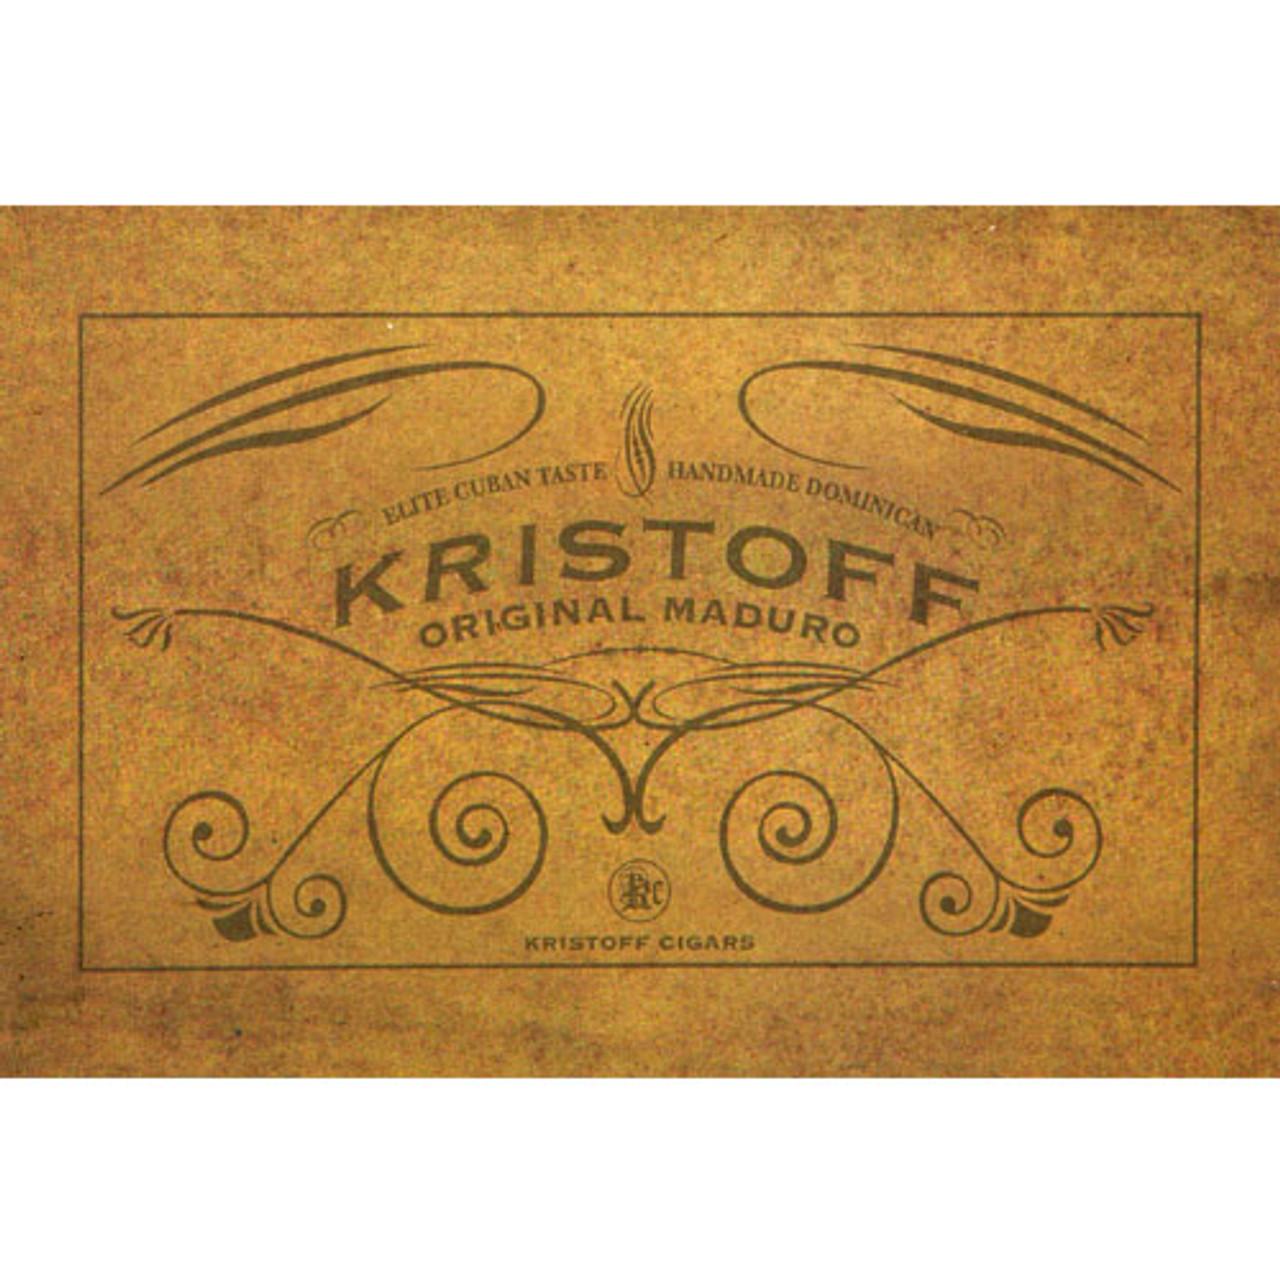 Kristoff Original Maduro Torpedo Cigars - 6.25 x 52 (Box of 20)